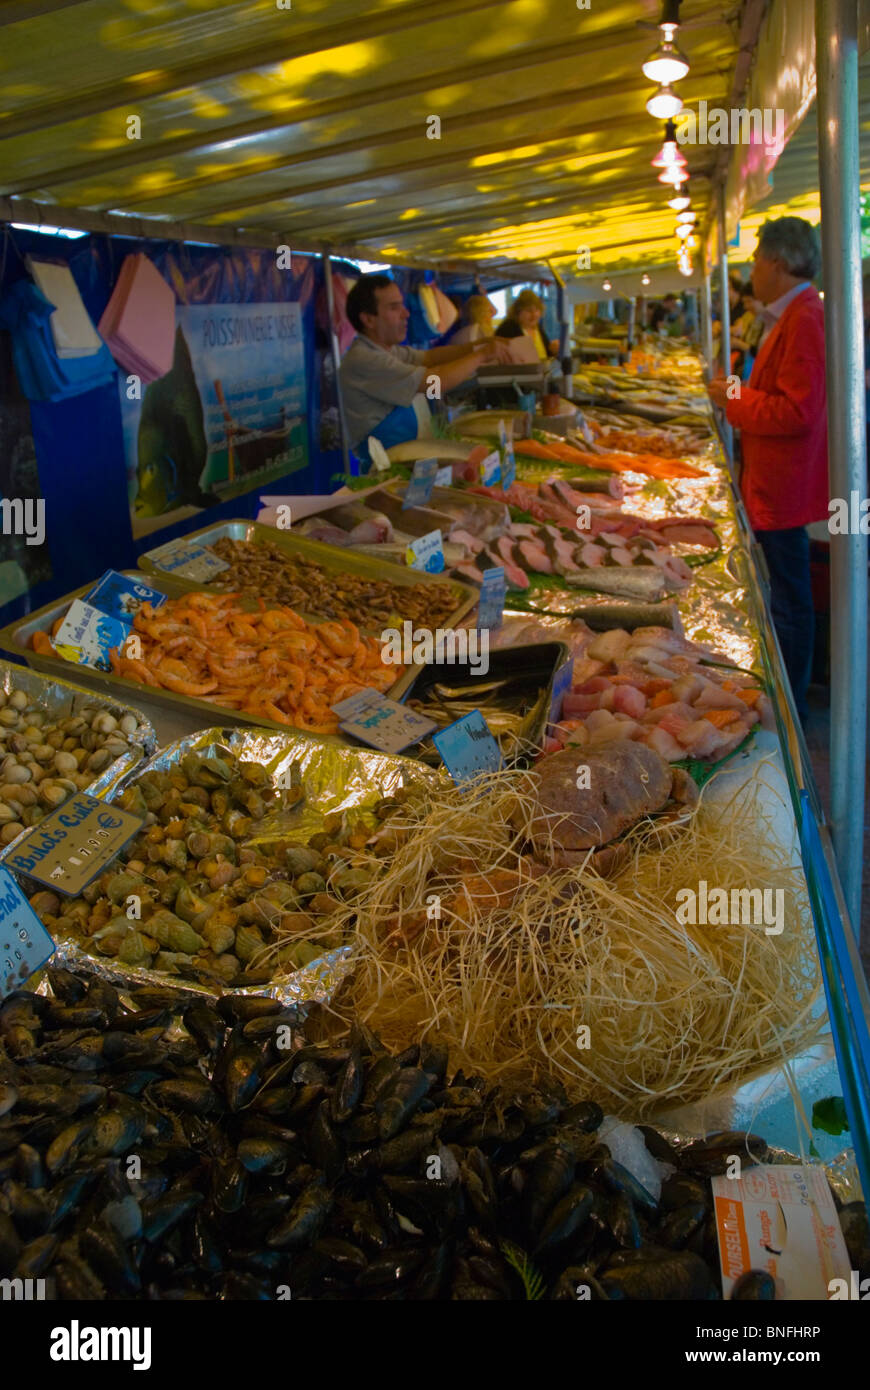 Seafood stall at Marche Parmentier street market along Boulevard Richard Lenoir Paris France Europe - Stock Image